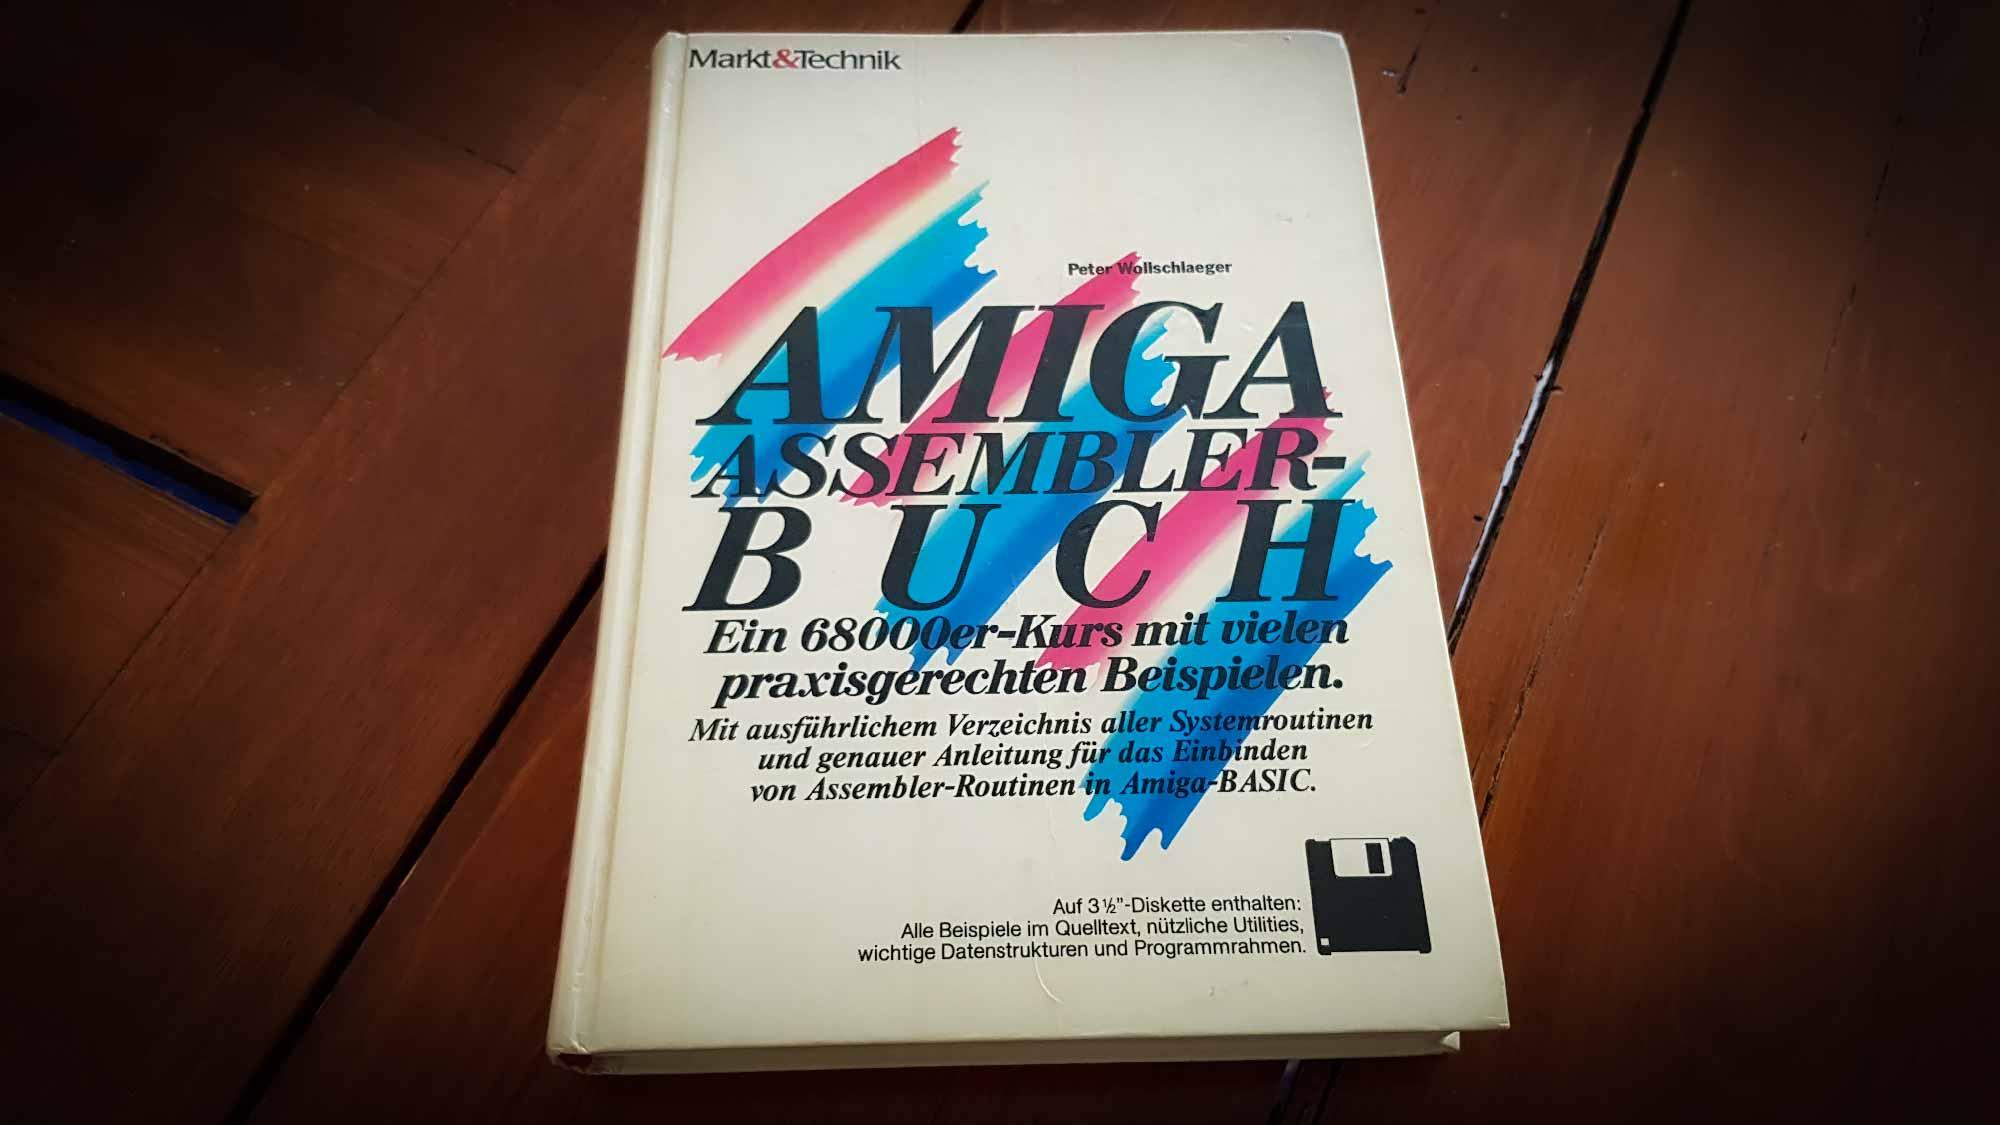 Amiga Assembler Buch